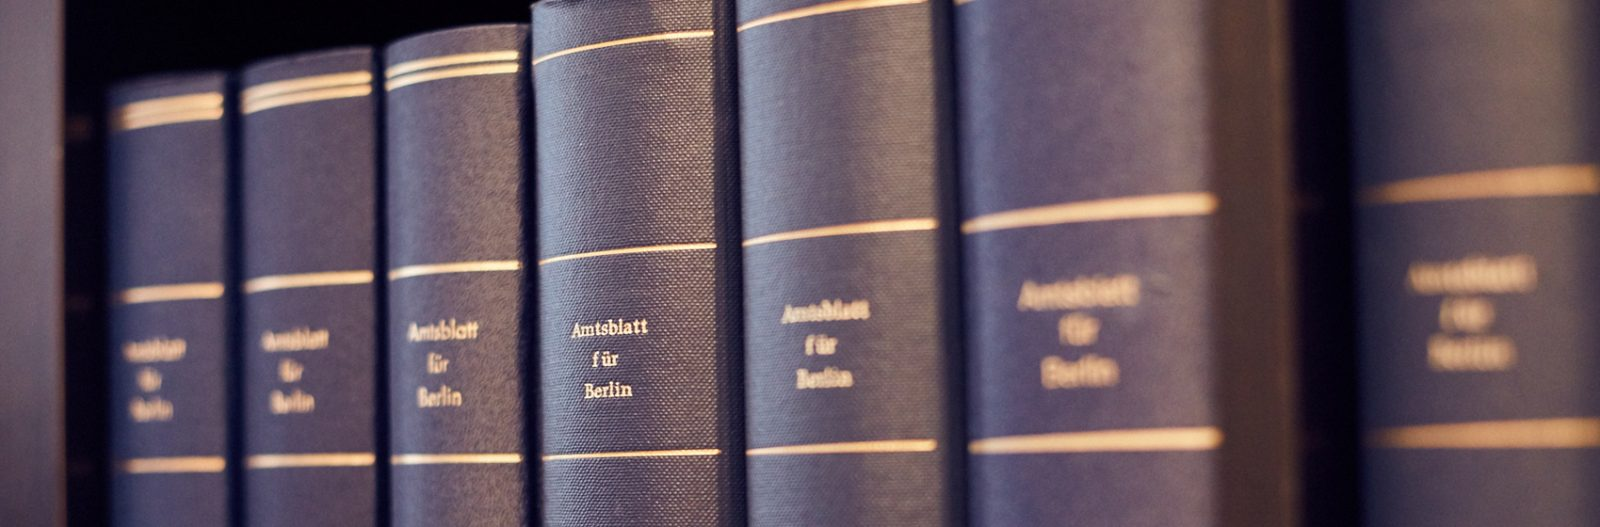 Bücher Amtsblatt für Berlin